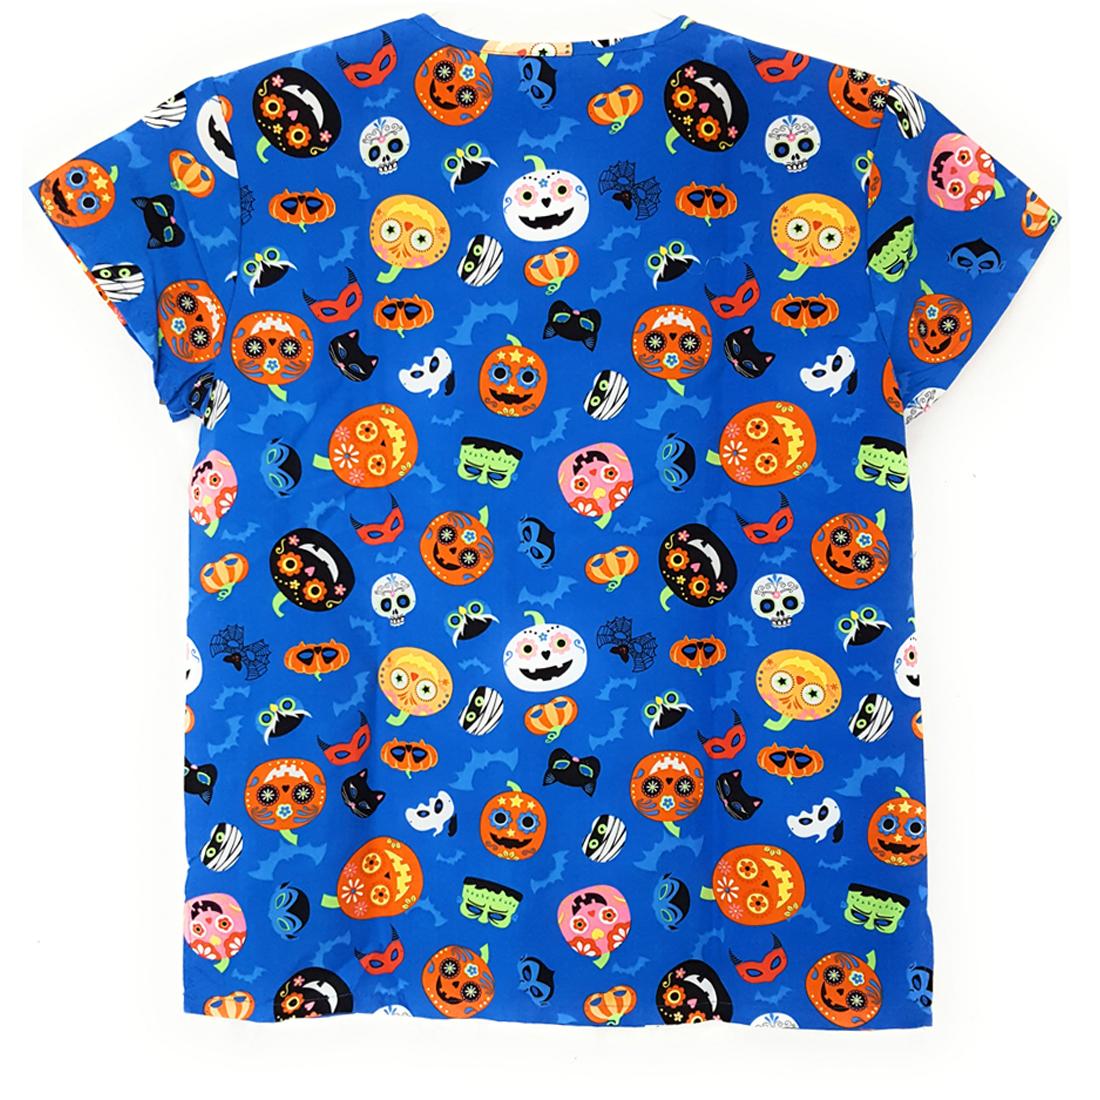 V-Neck-Halloween-Print-Scrub-Top-Microfiber-Medical-Uniform-Shirt-DSF-Uniforms miniature 9